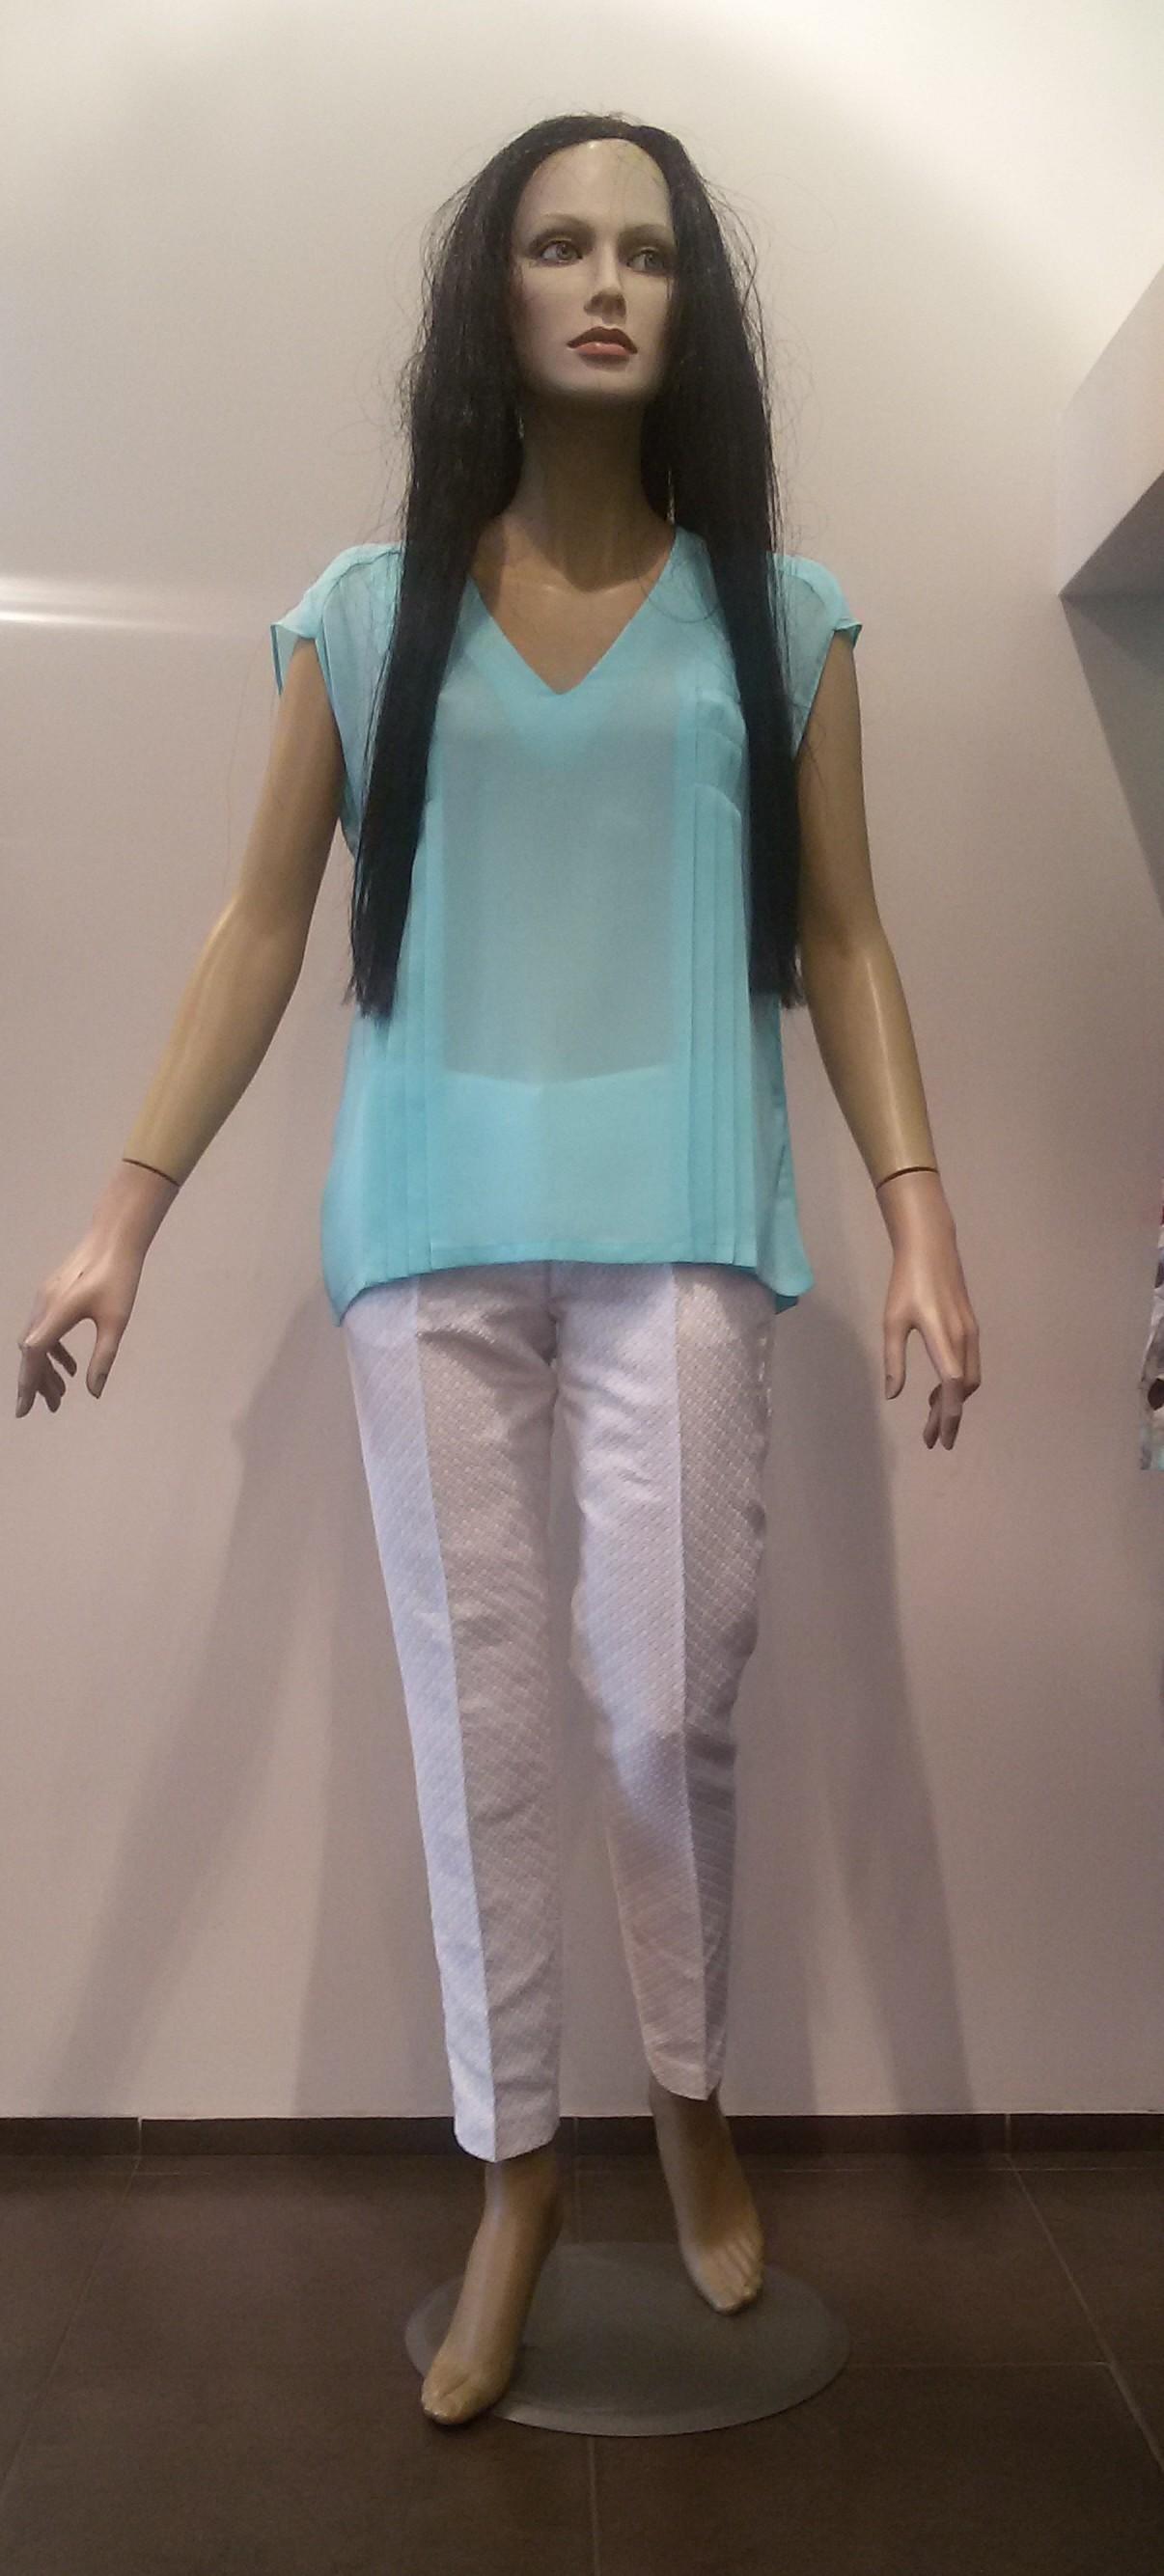 Рубашка голубая KI6? Who are you? СМ11